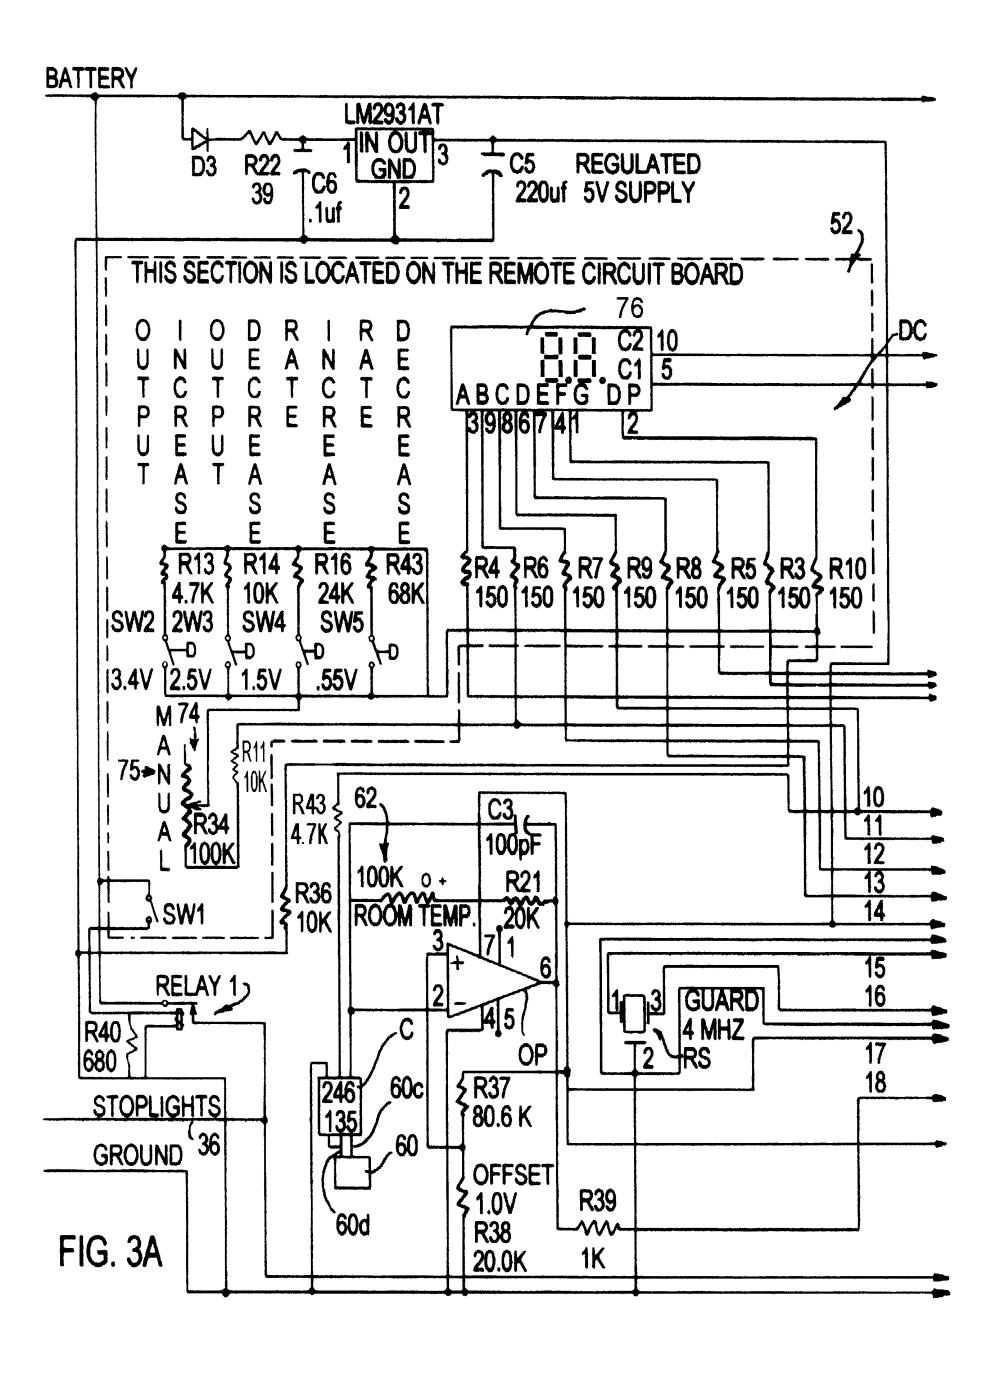 medium resolution of tekonsha p3 ke control wiring harness tekonsha sentinel tekonsha voyager xp wiring diagram tekonsha voyager electric brake wiring diagram